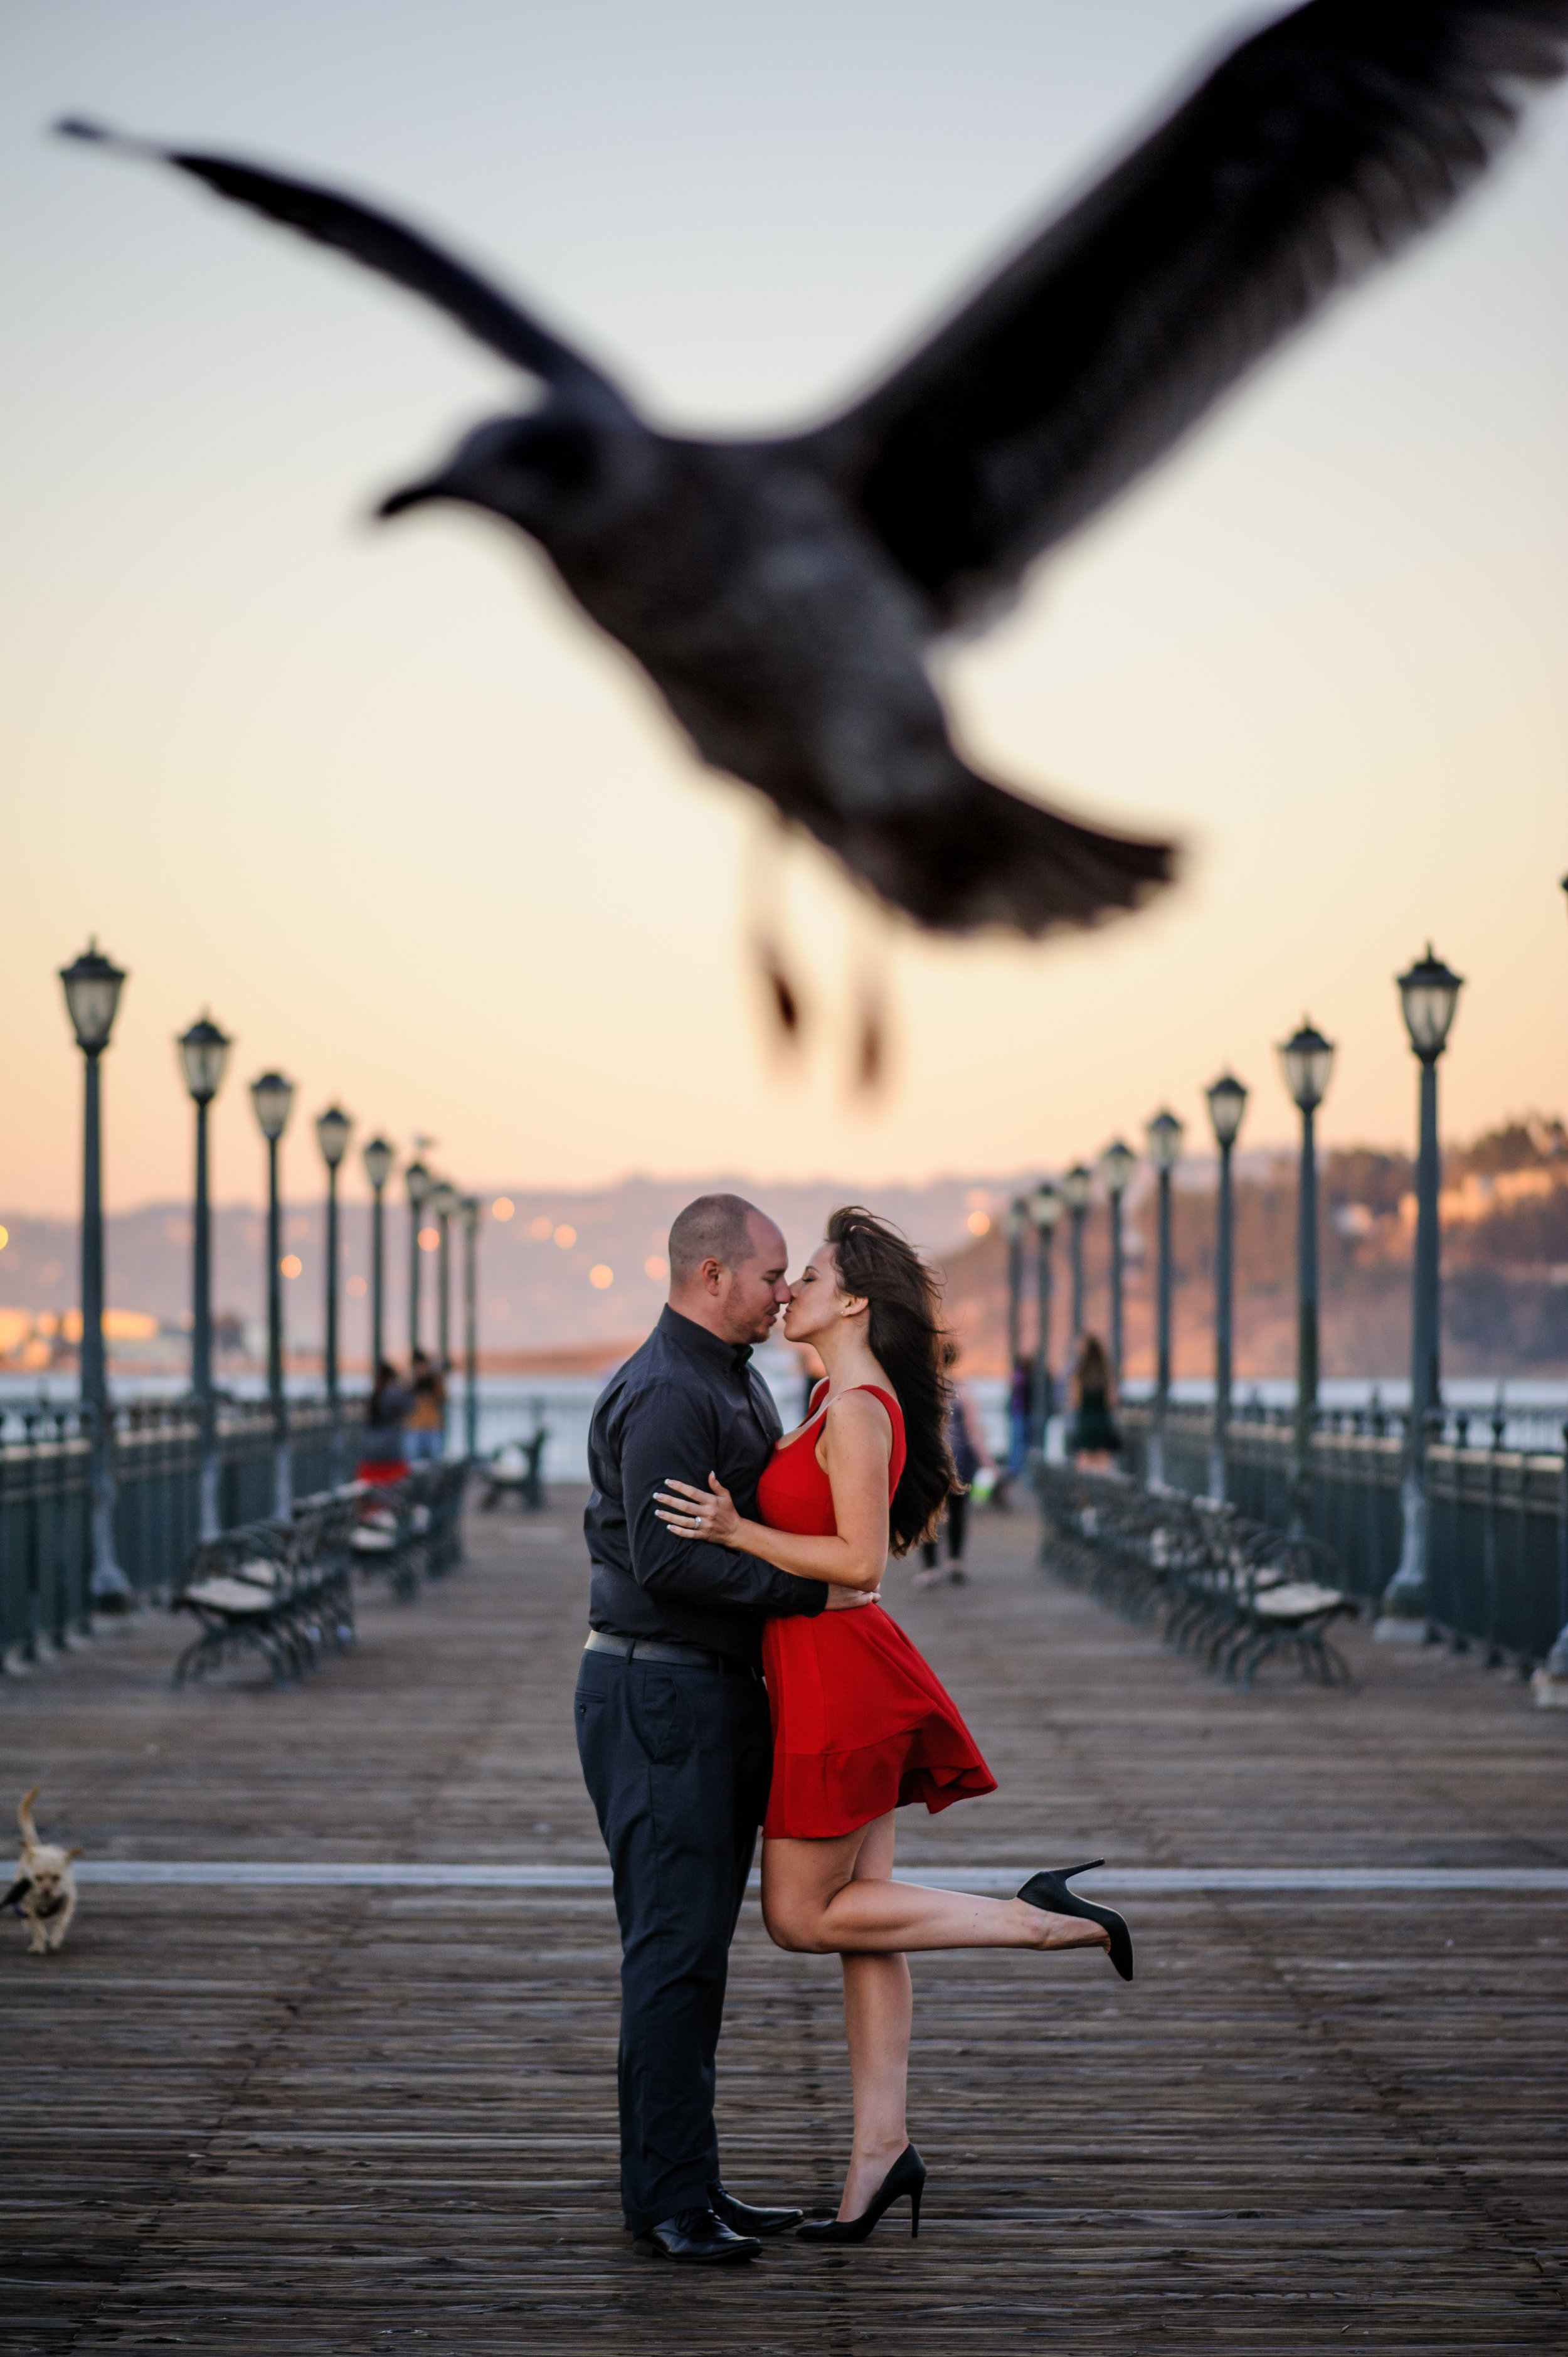 jenny-sean-016-san-francisco-giants-engagement-wedding-photographer-katherine-nicole-photography.JPG